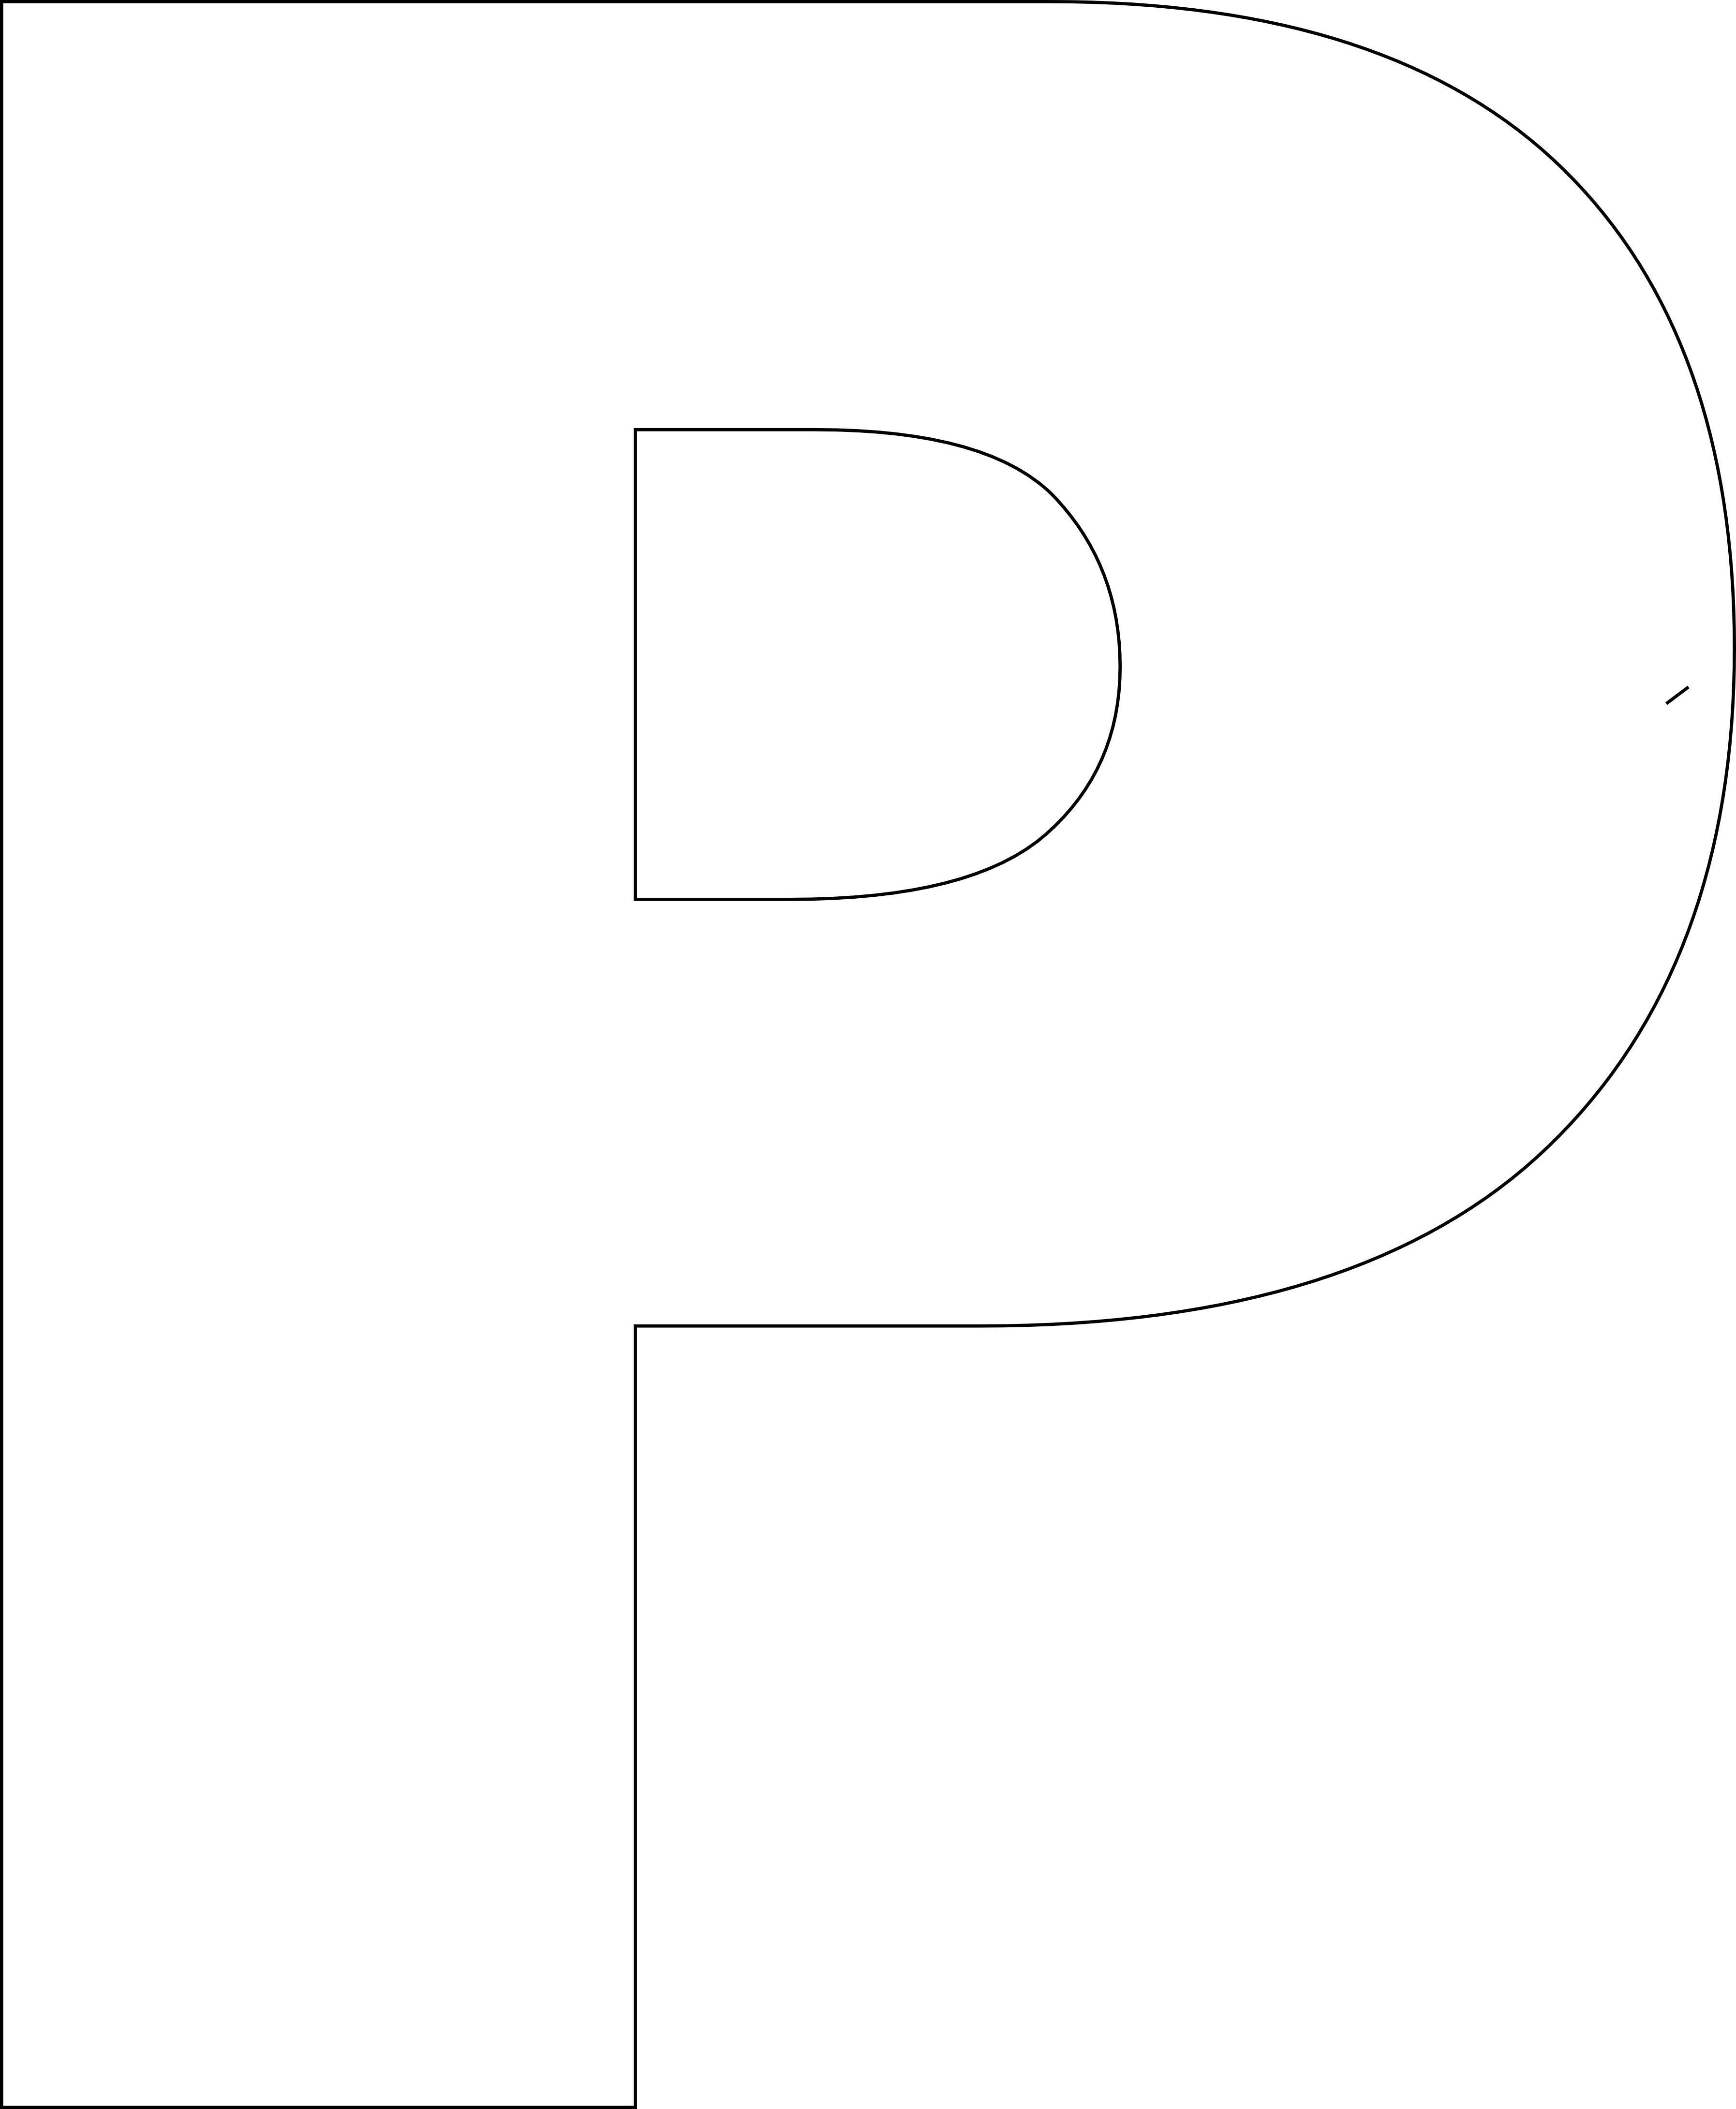 Free Printable Upper Case Alphabet Template | School Ideas - Free Printable Letter Templates